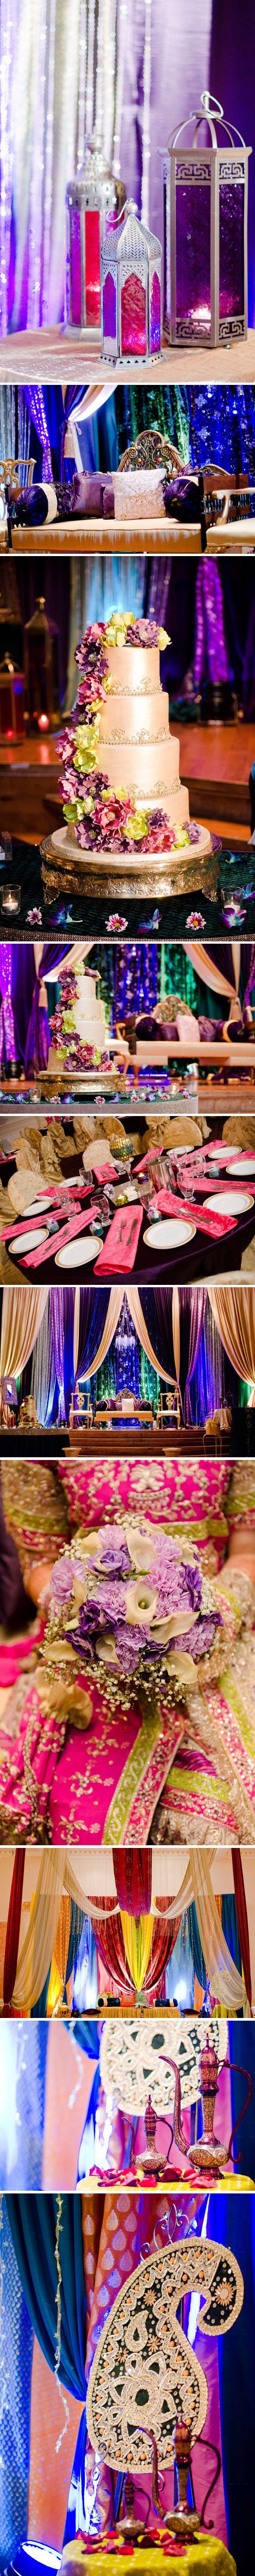 Wedding decoration ideas colors  Lavish Dulhanlove these colors  for more wedding decor ideas